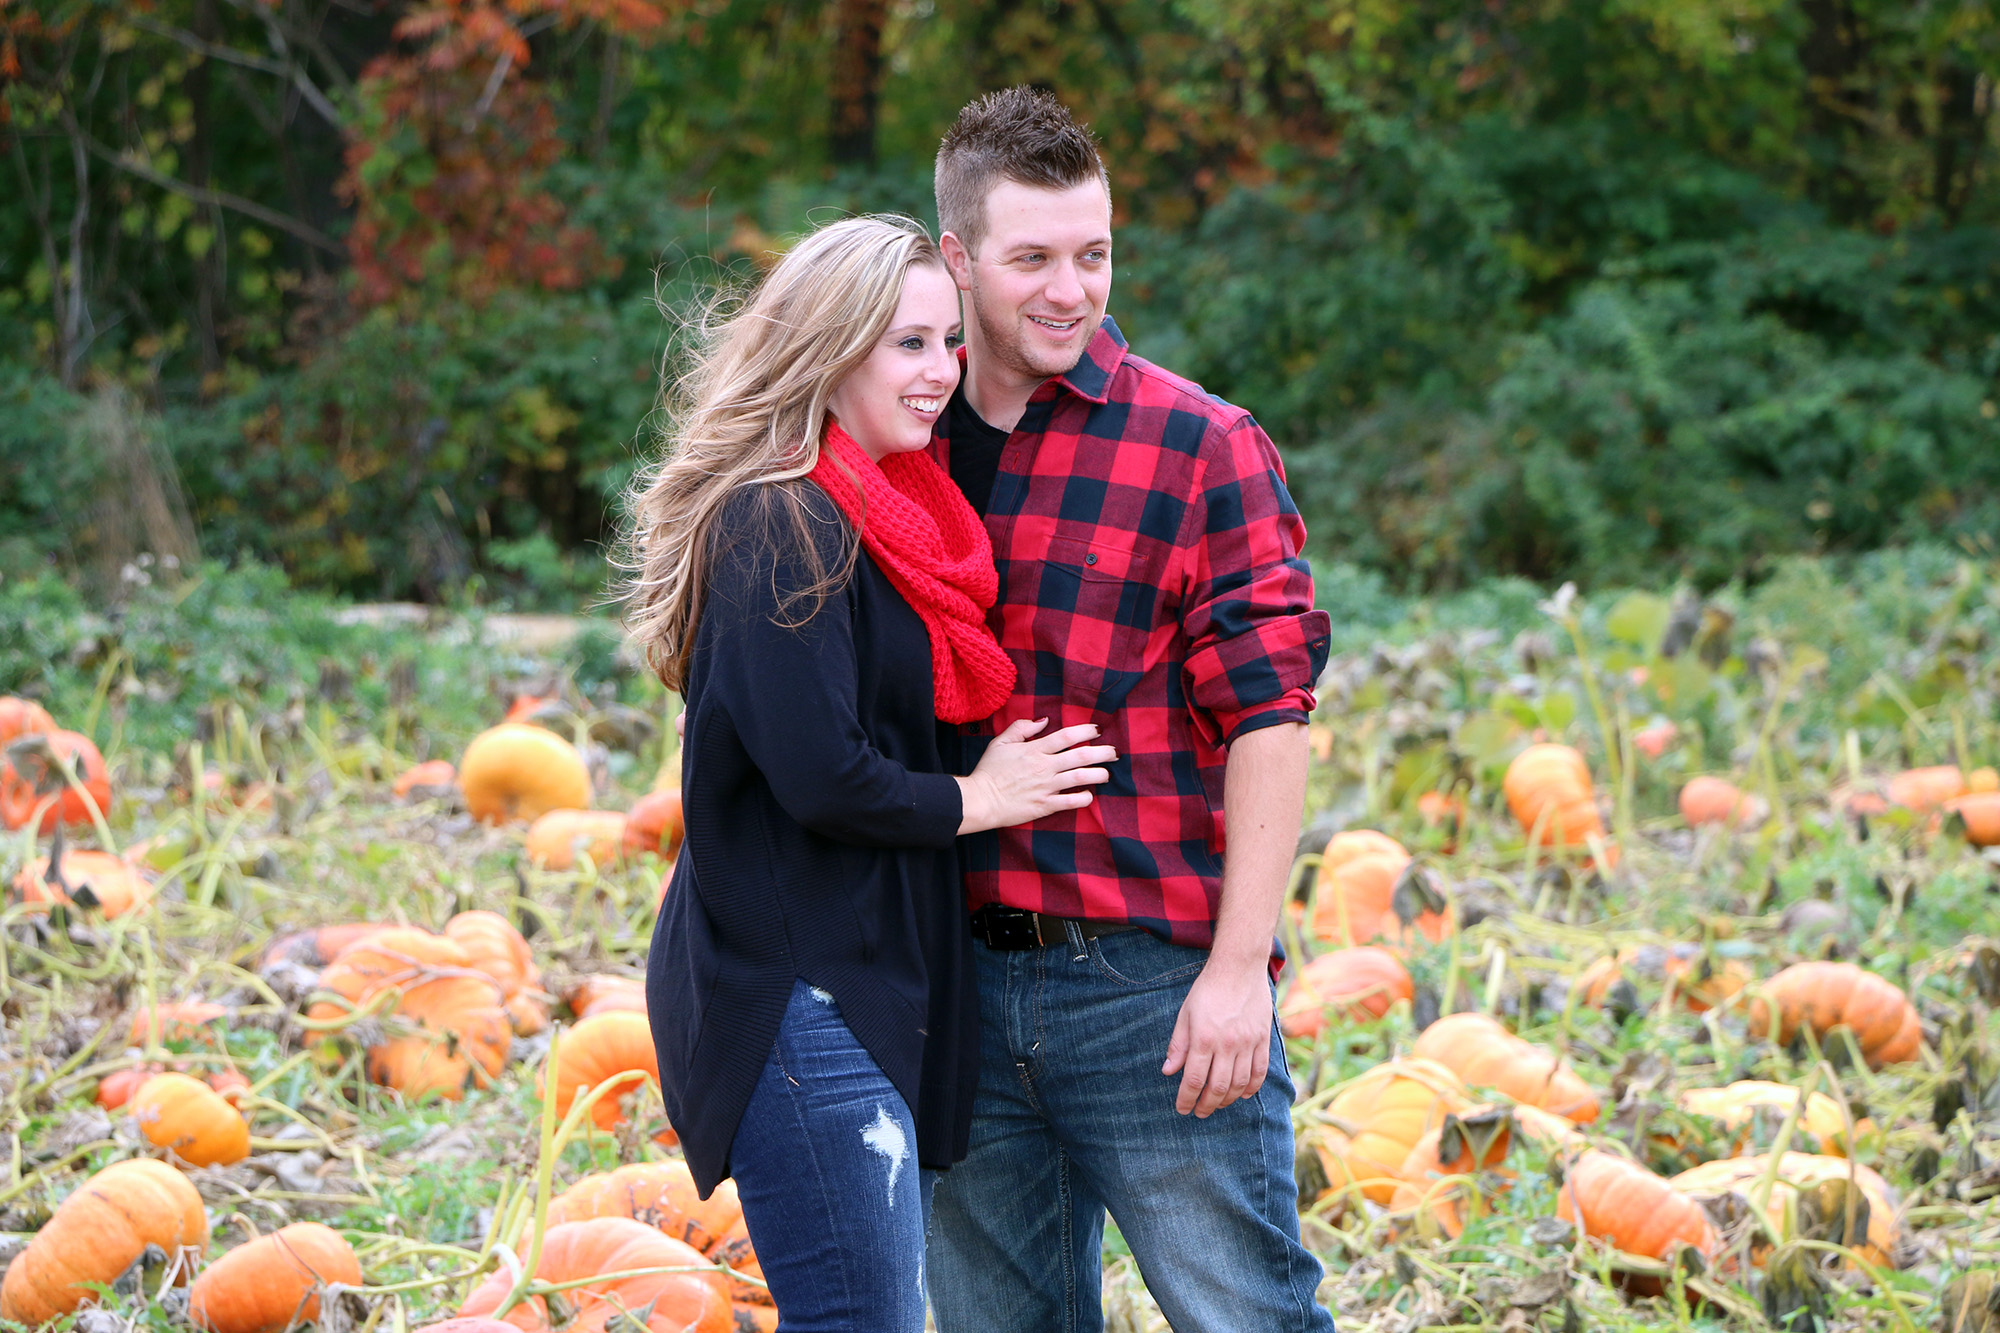 Fall Into Autumn Photoshoots!